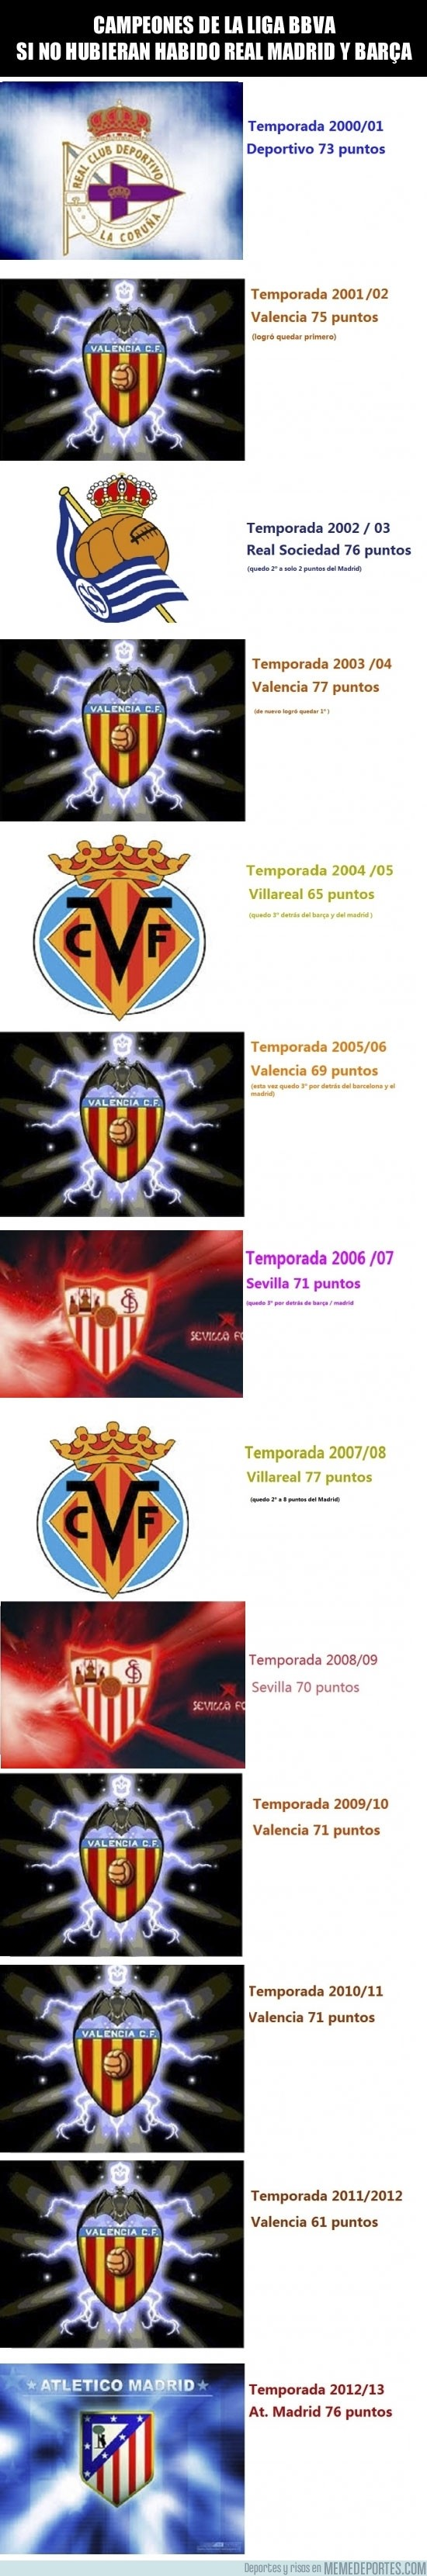 182389 - La Liga BBVA sin Madrid ni Barça